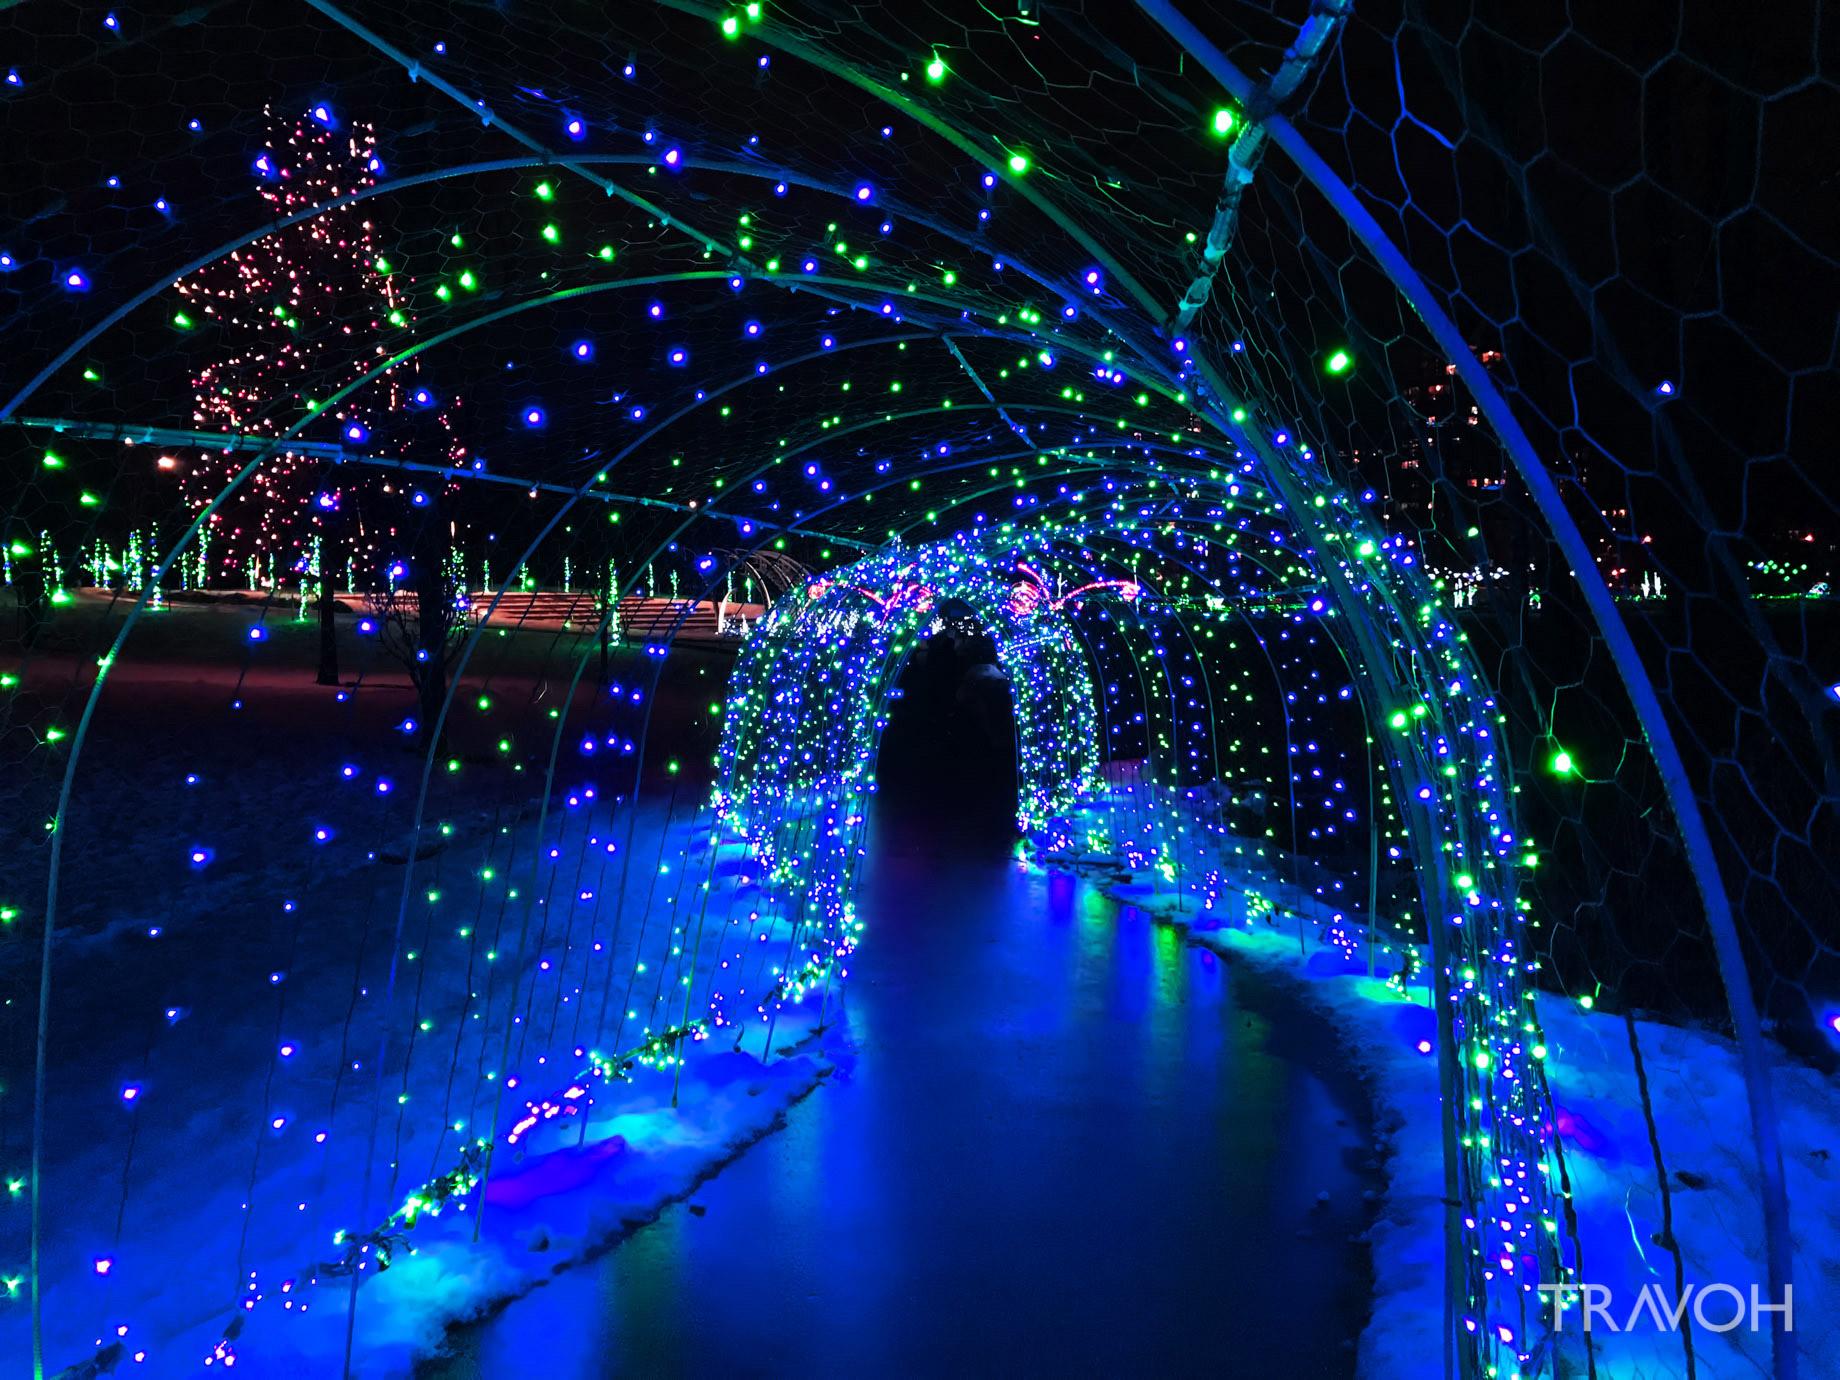 Lafarge Winter Lights Display - Caterpillar - Coquitlam, BC, Canada